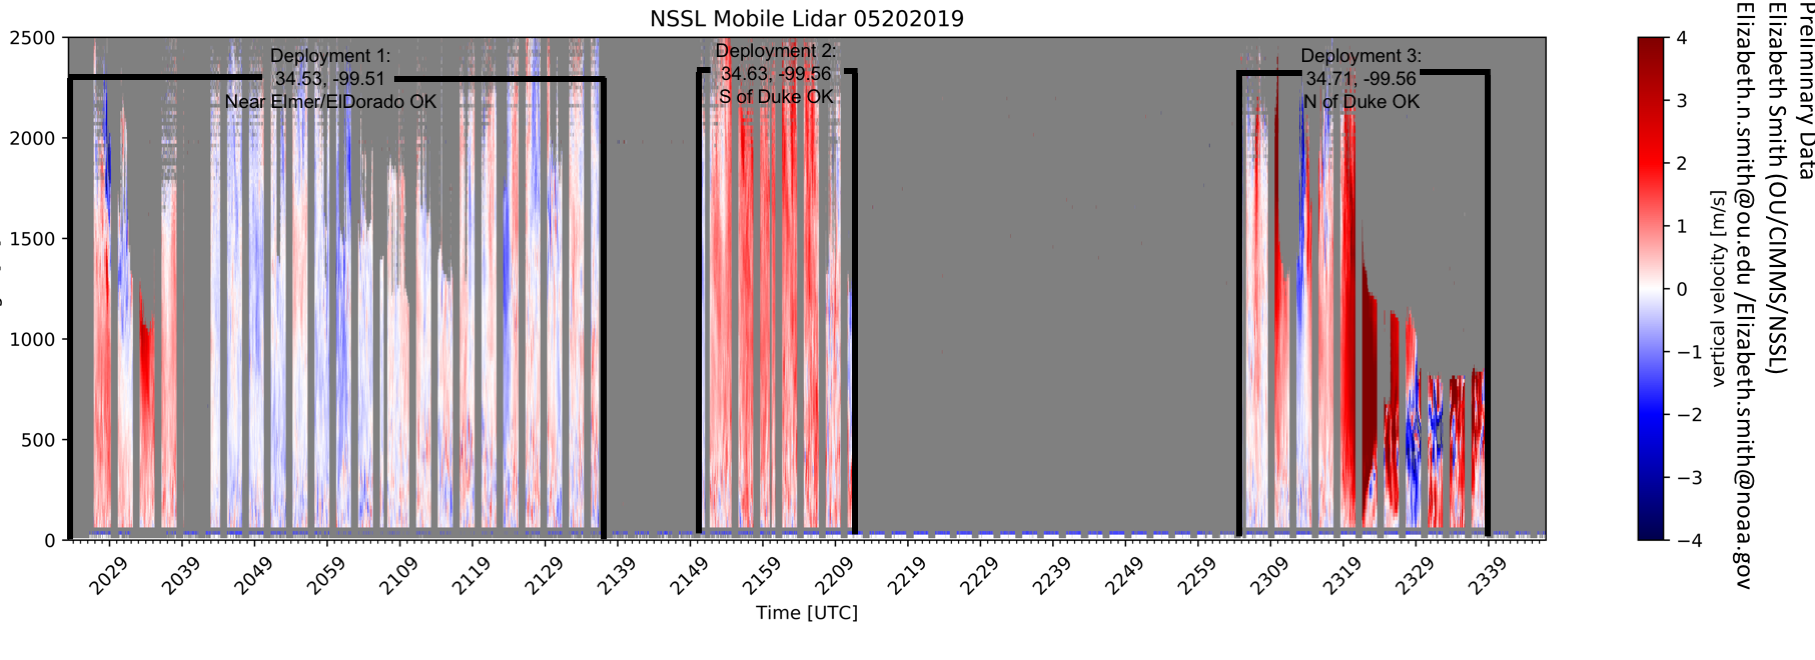 Lidar.nssl_mobile_lidar.201905202000.verticalvelocity